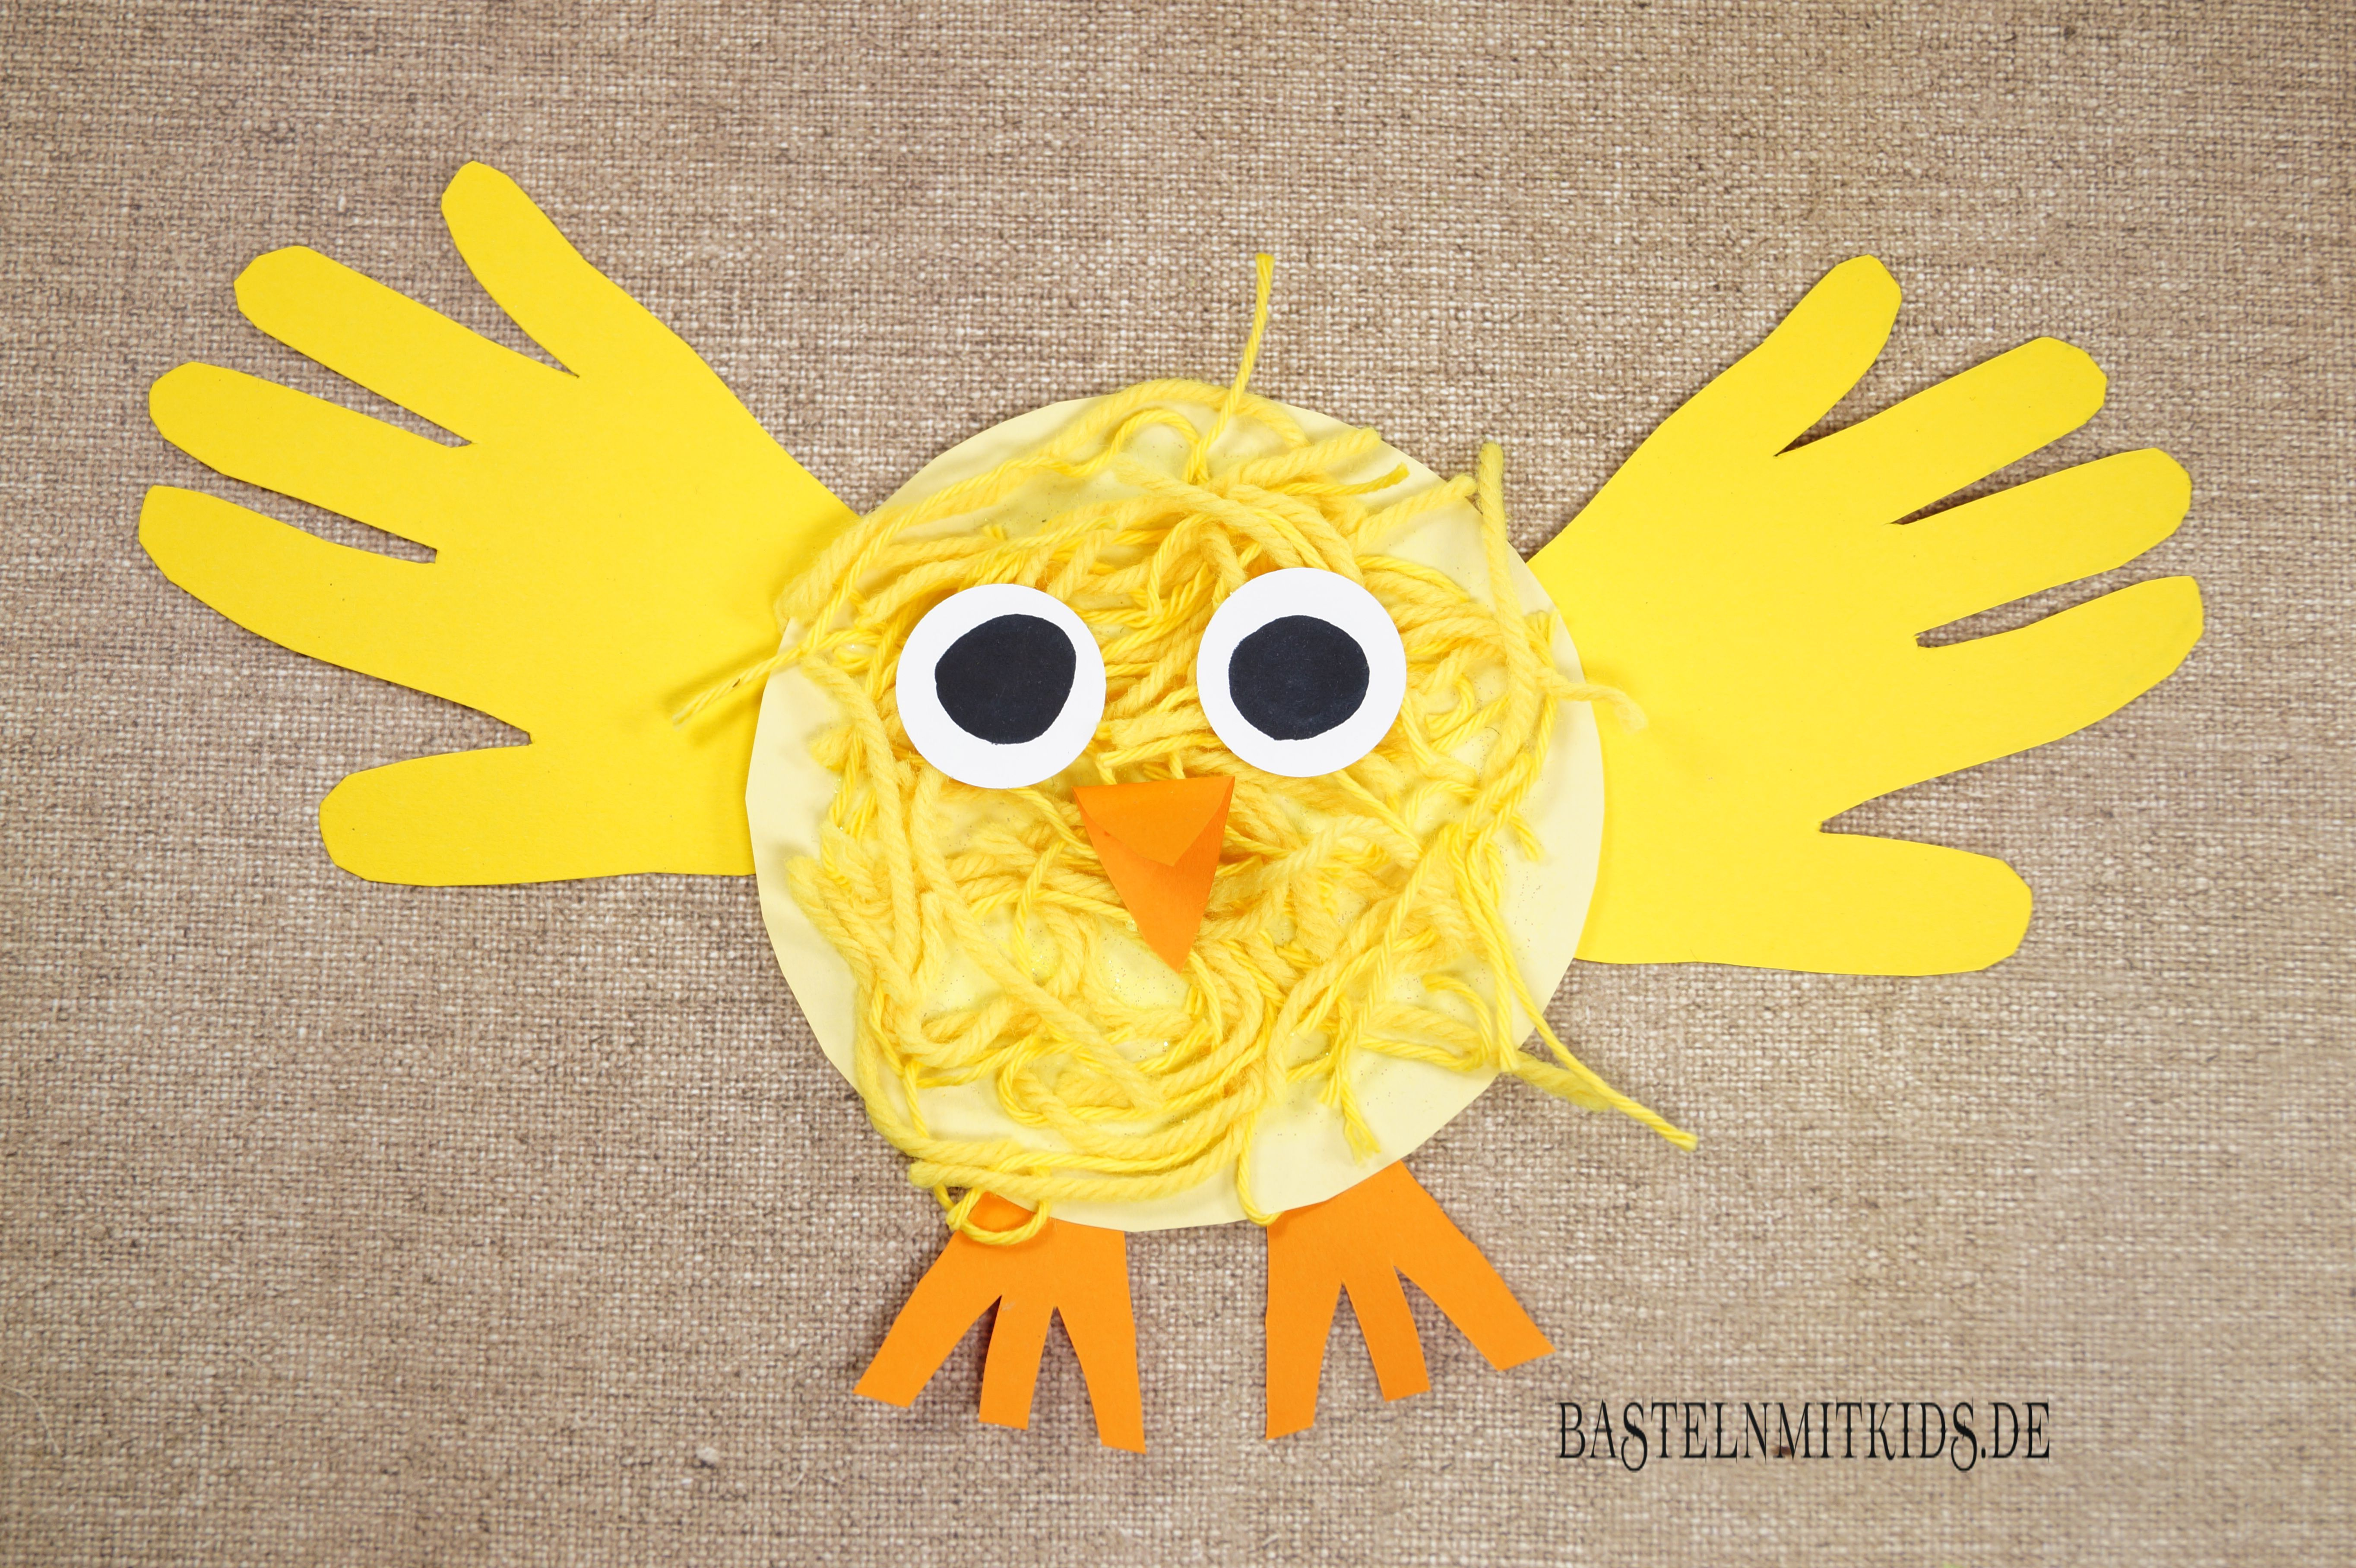 Küken Basteln Malen Oder Stempeln Küken Basteln Easter Crafts